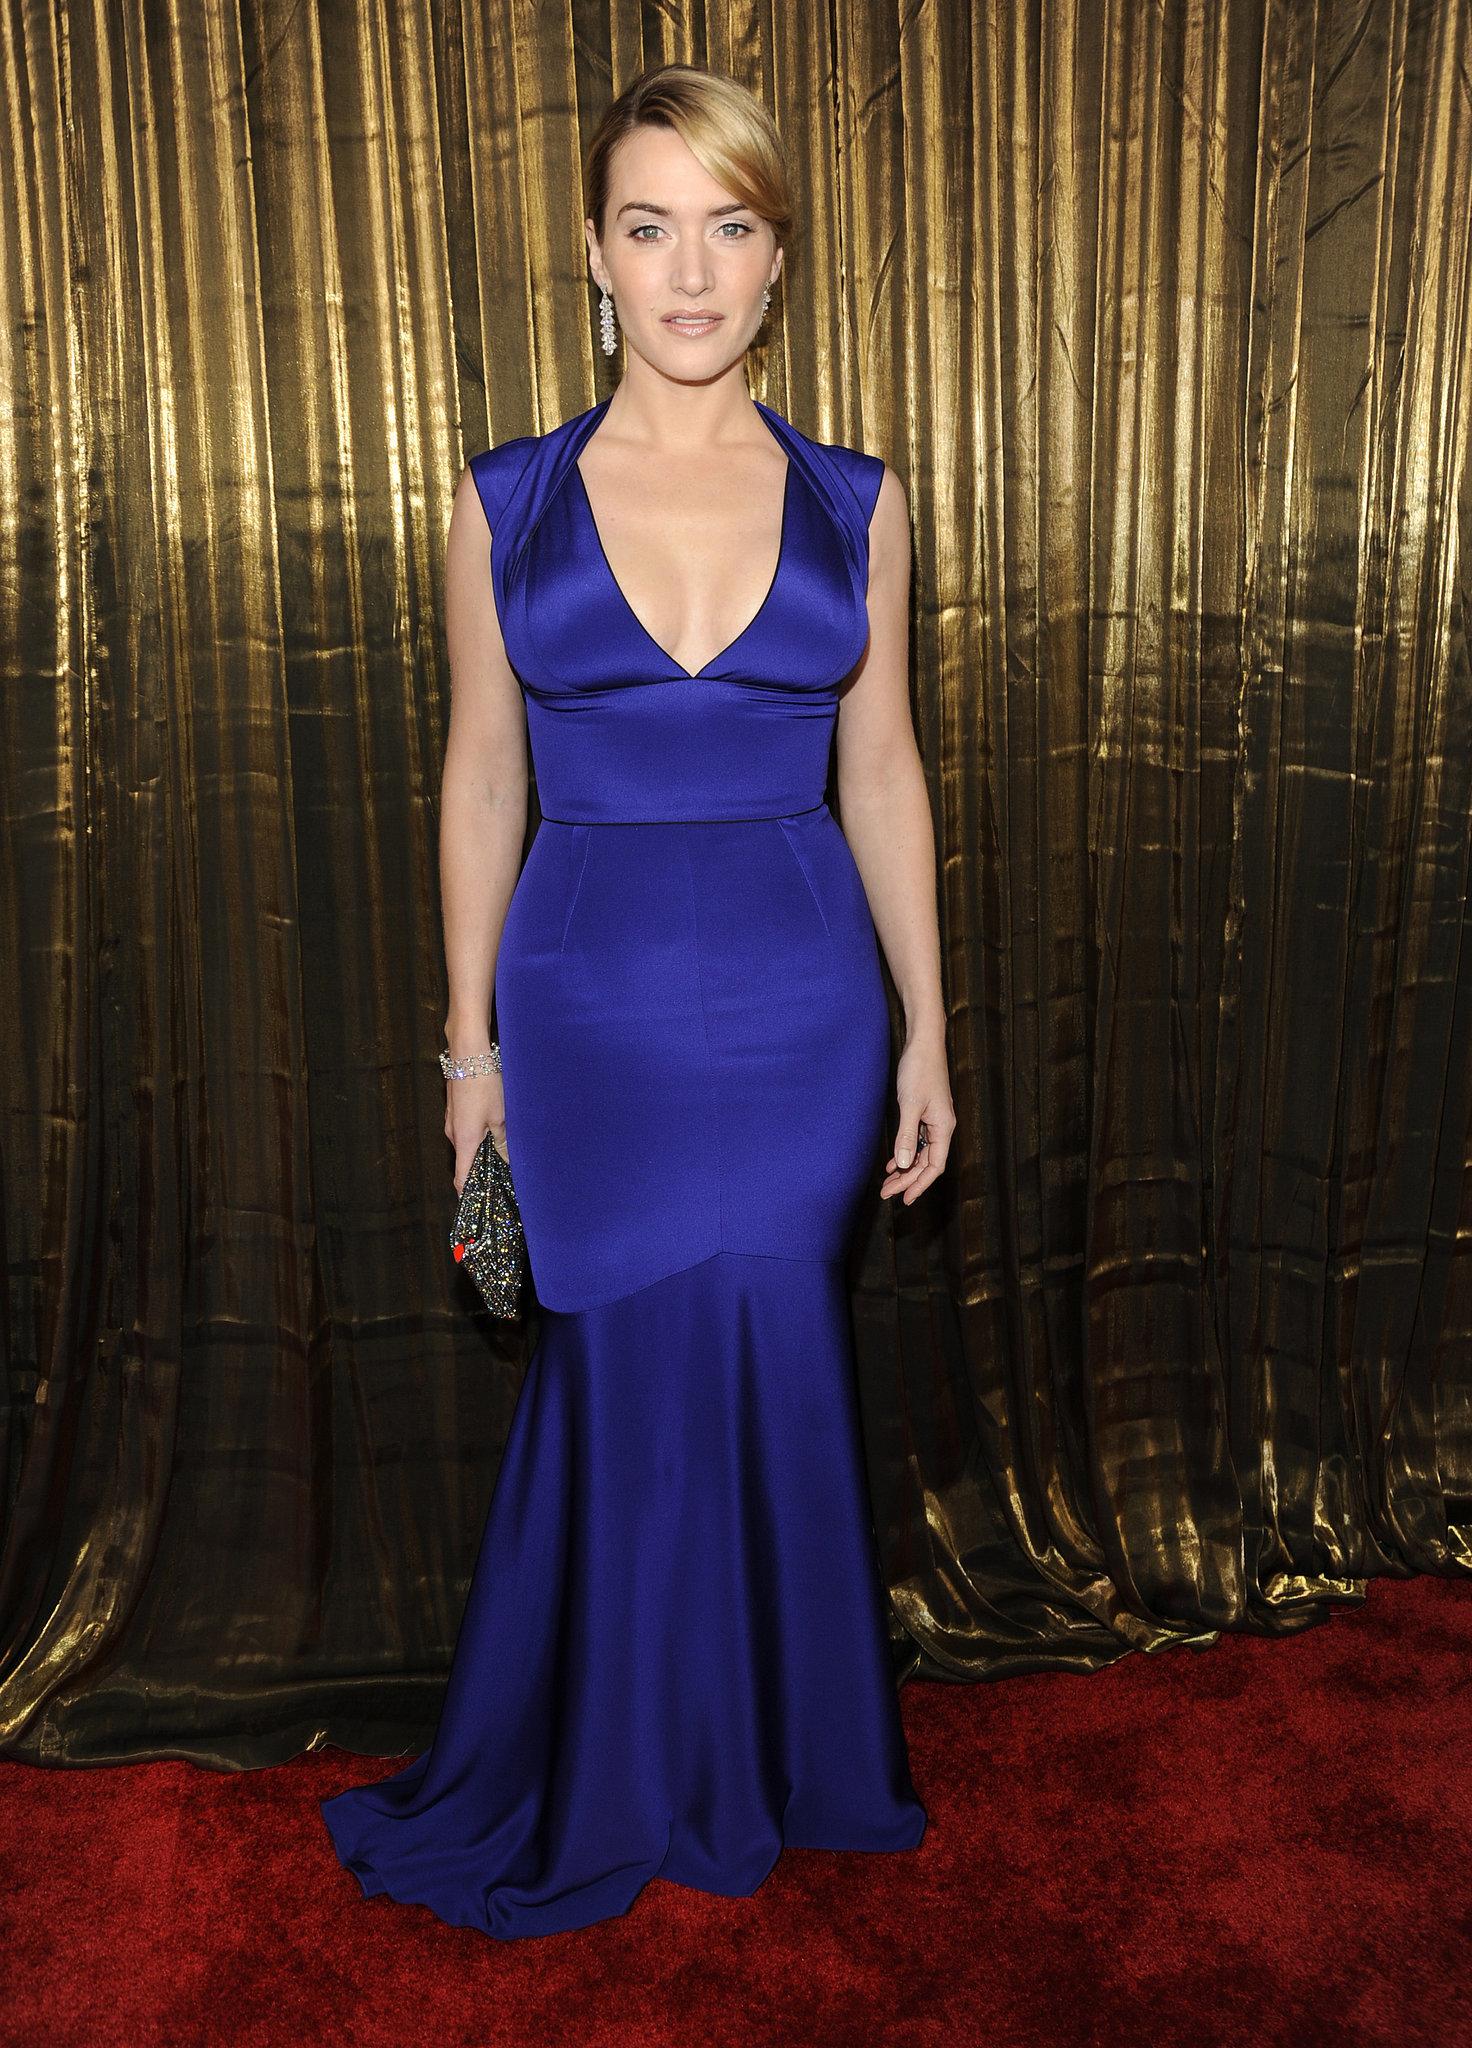 Kate Winslet at the 2009 SAG Awards